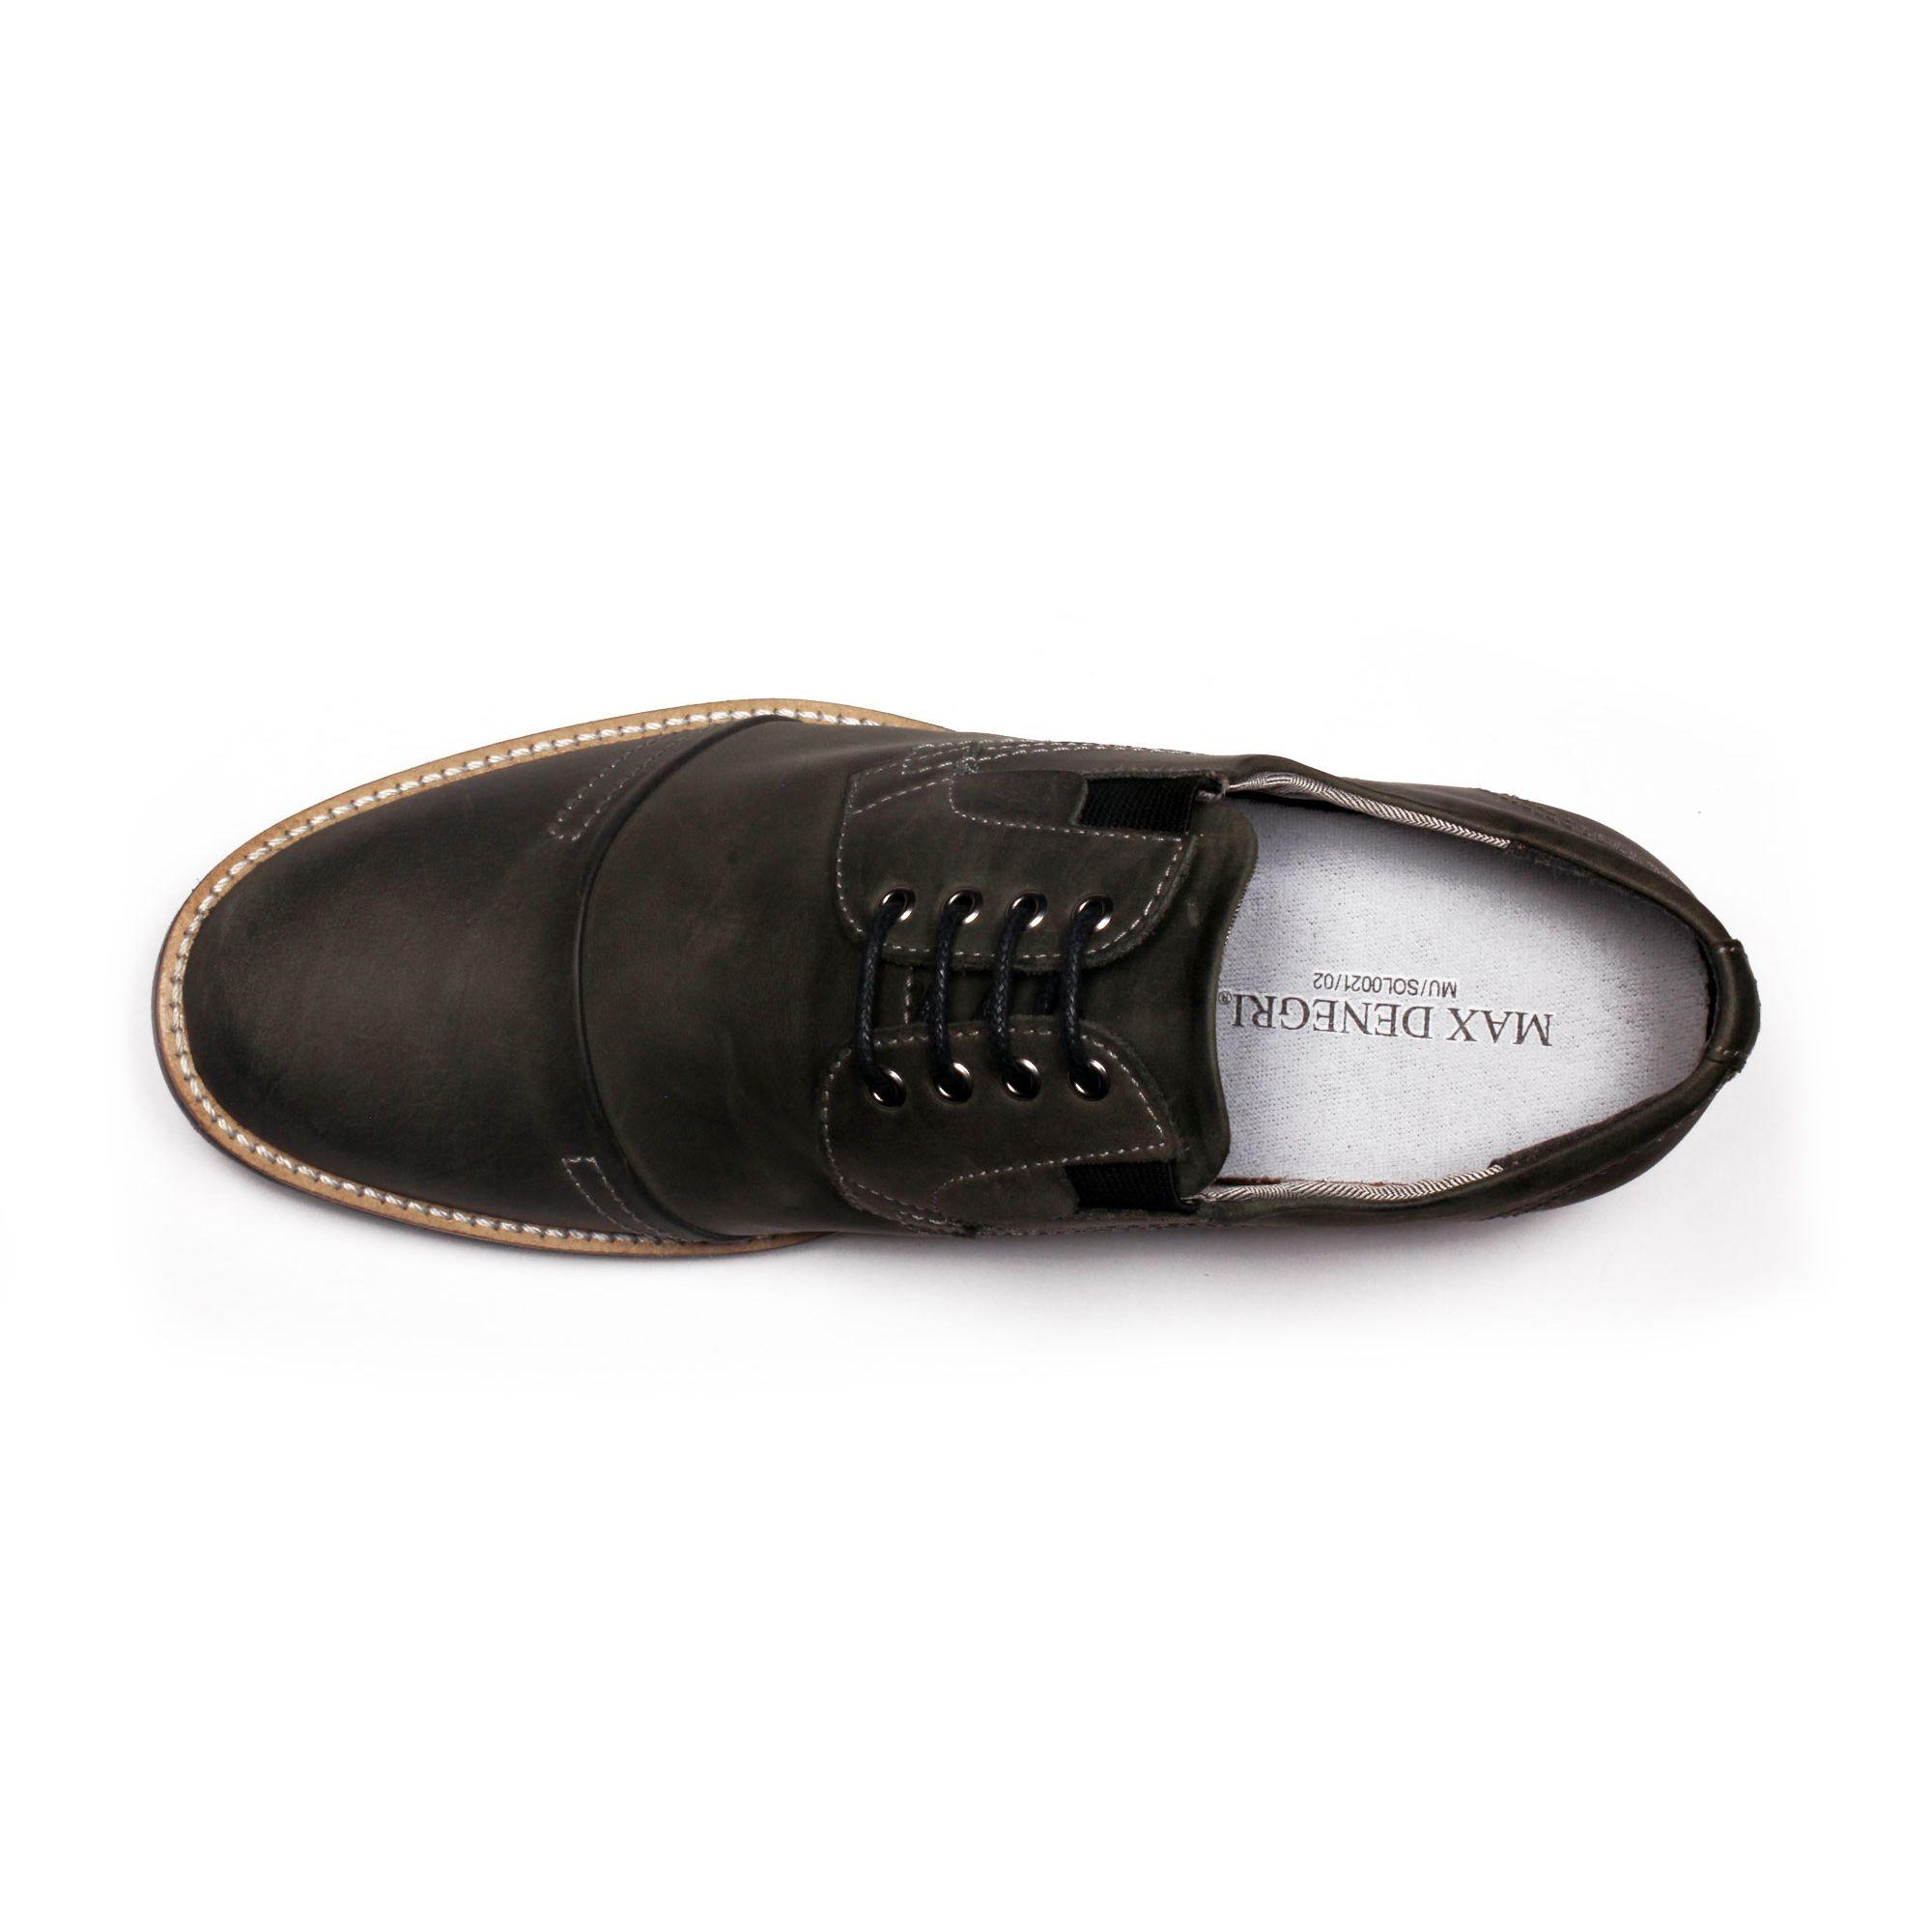 Zapato Casual Trend Gris Petroleo Max Denegri +7cms de Altura_70924